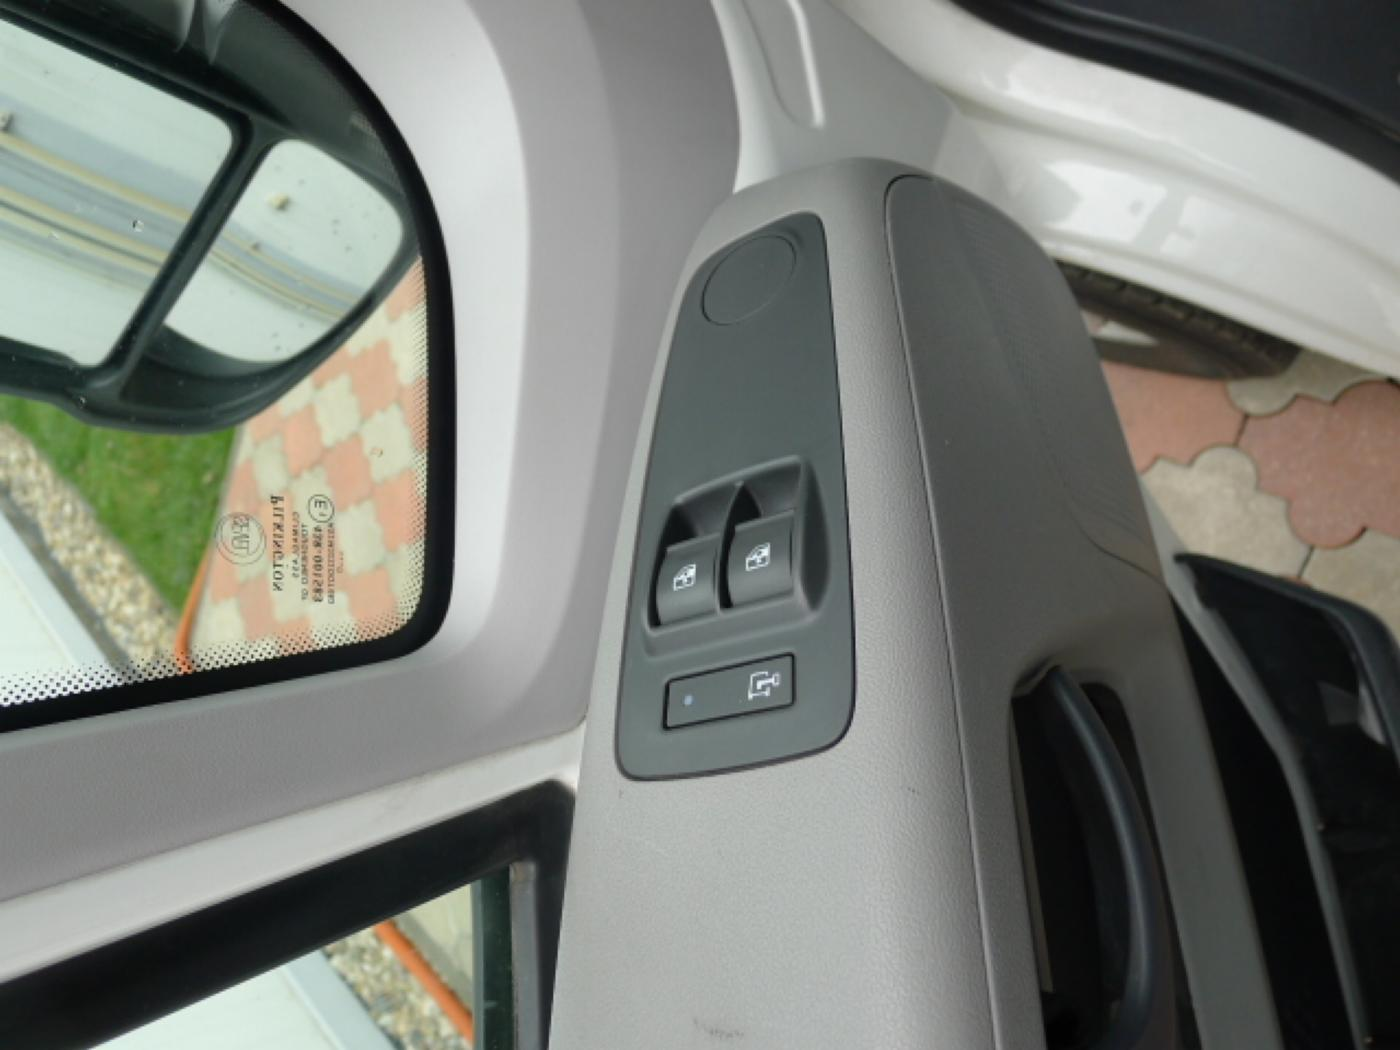 Peugeot Boxer 2.2 HDI L2H2 Klima Akce!!! Novinka - 15